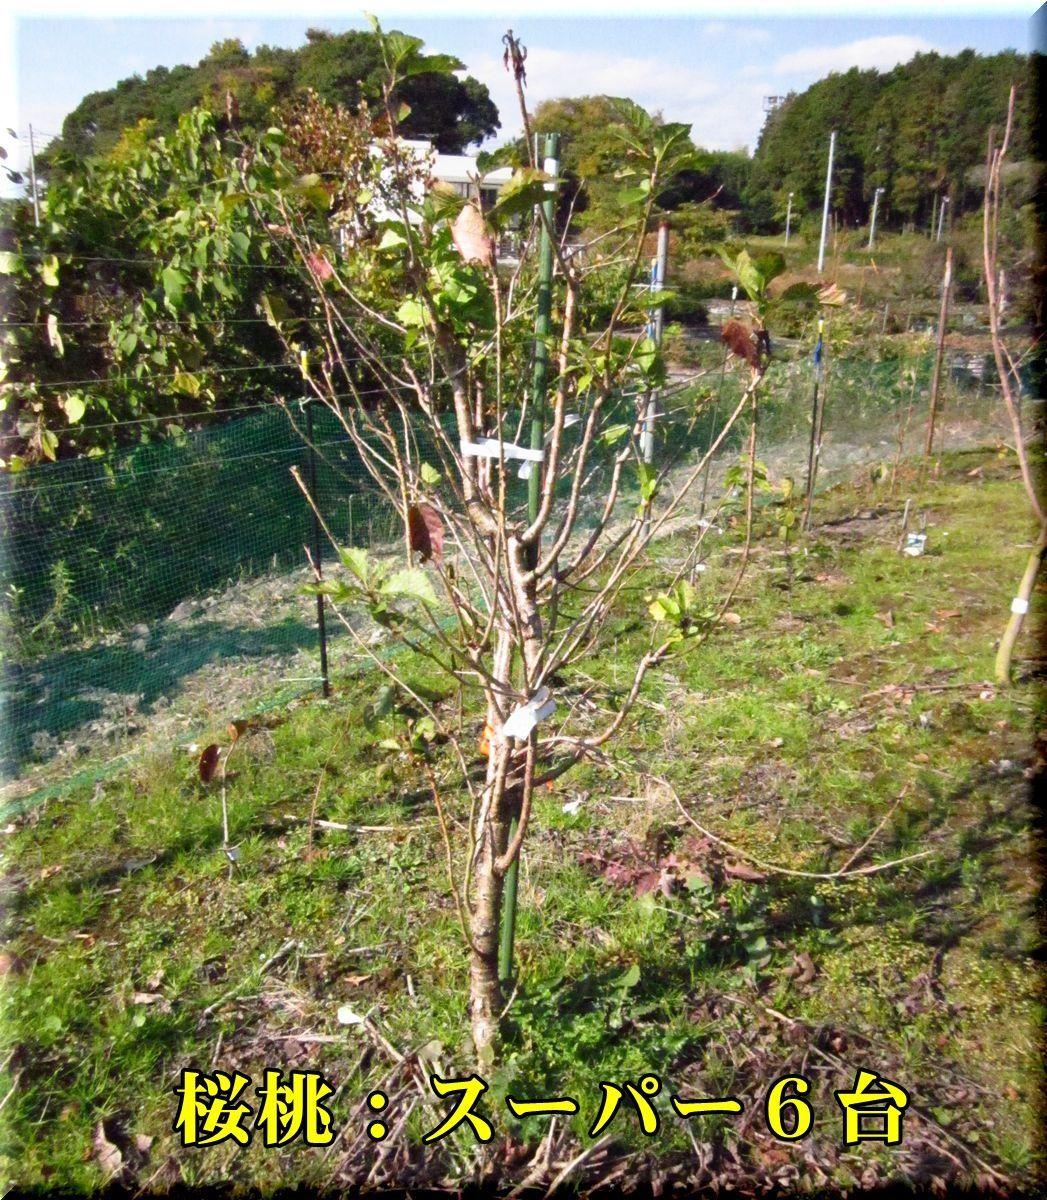 1S6_171129_006.jpg